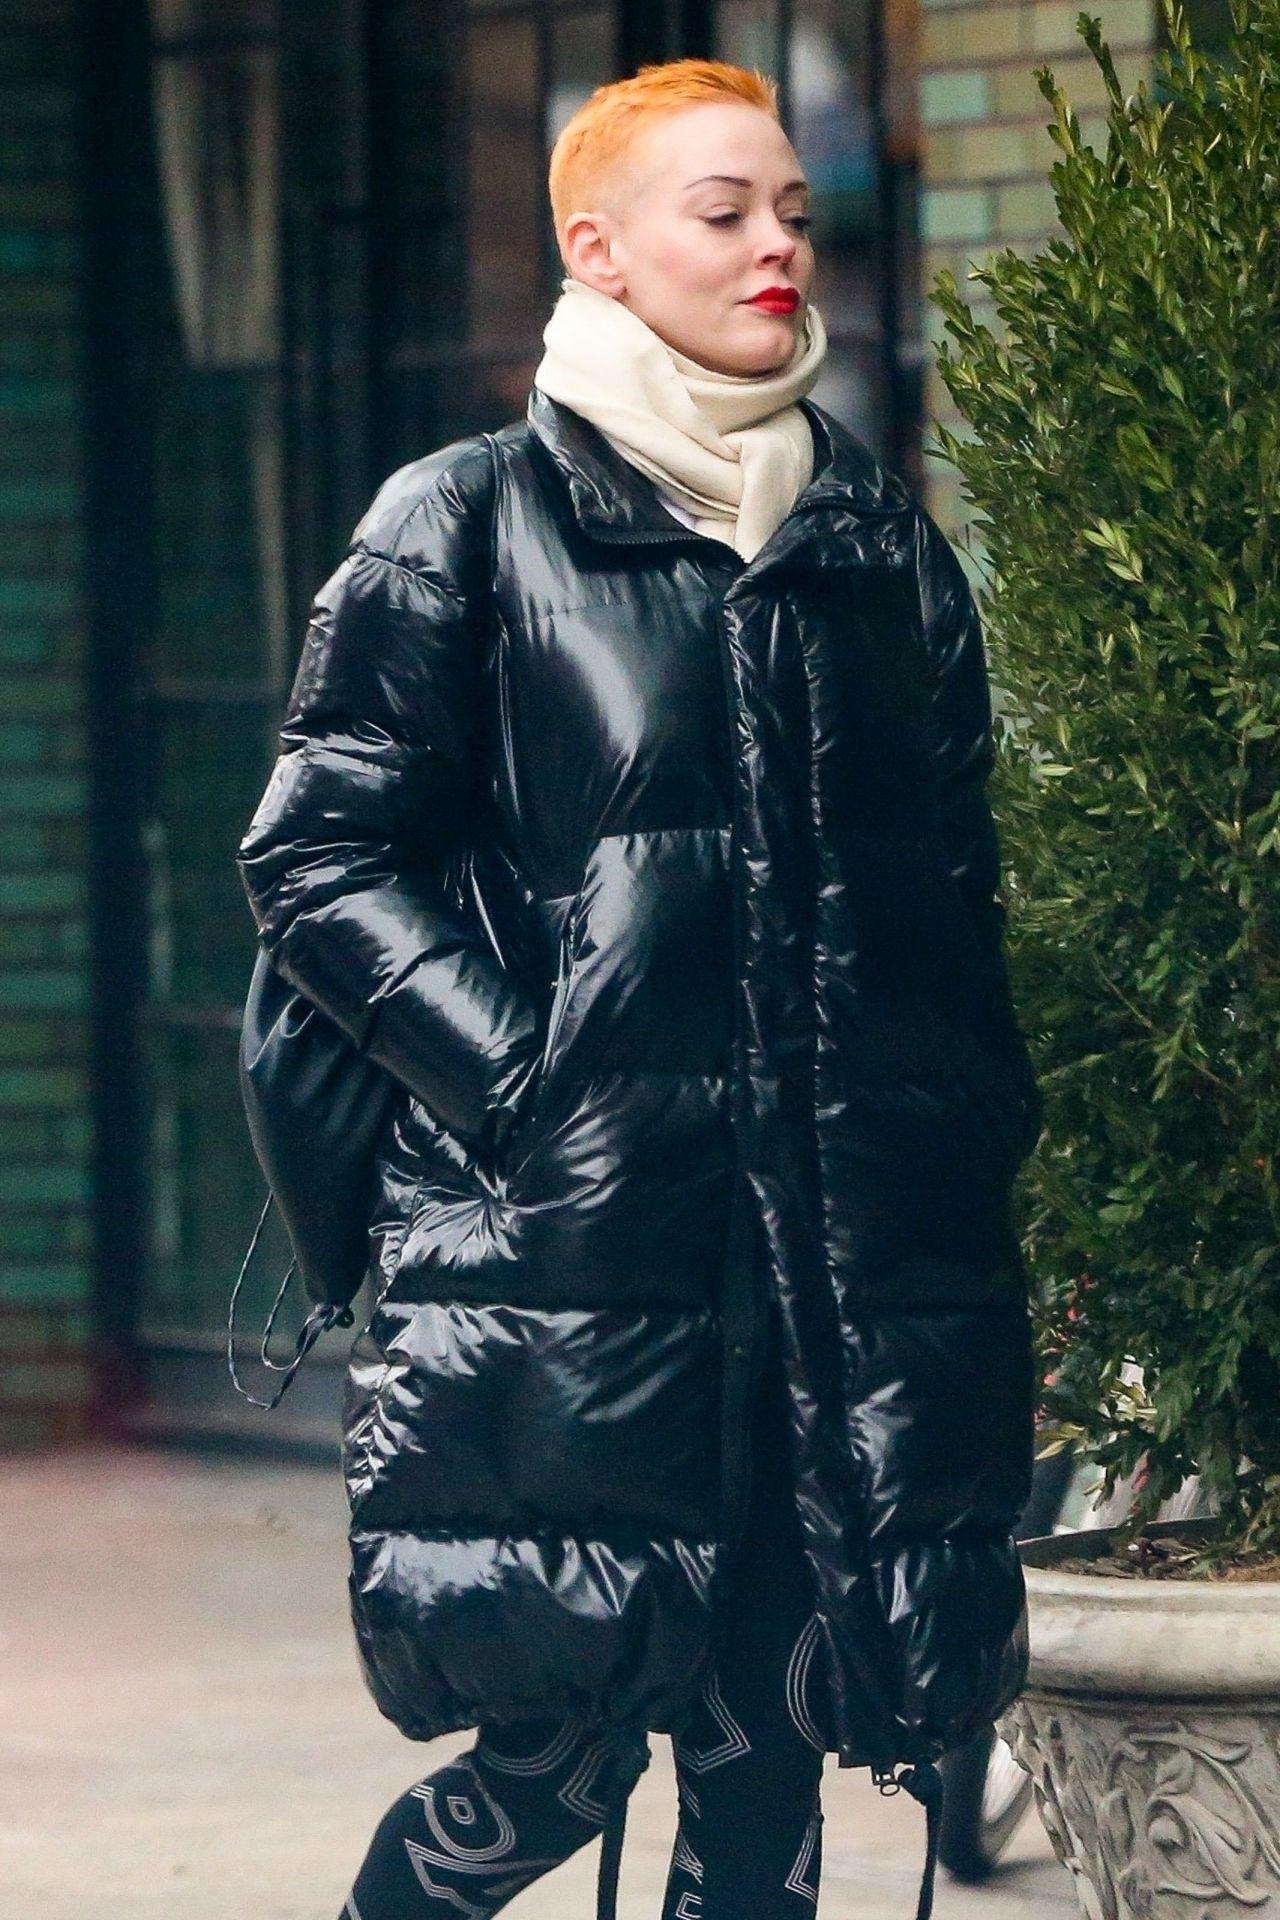 Rose Mcgowan Winter Street Style 01 23 2019